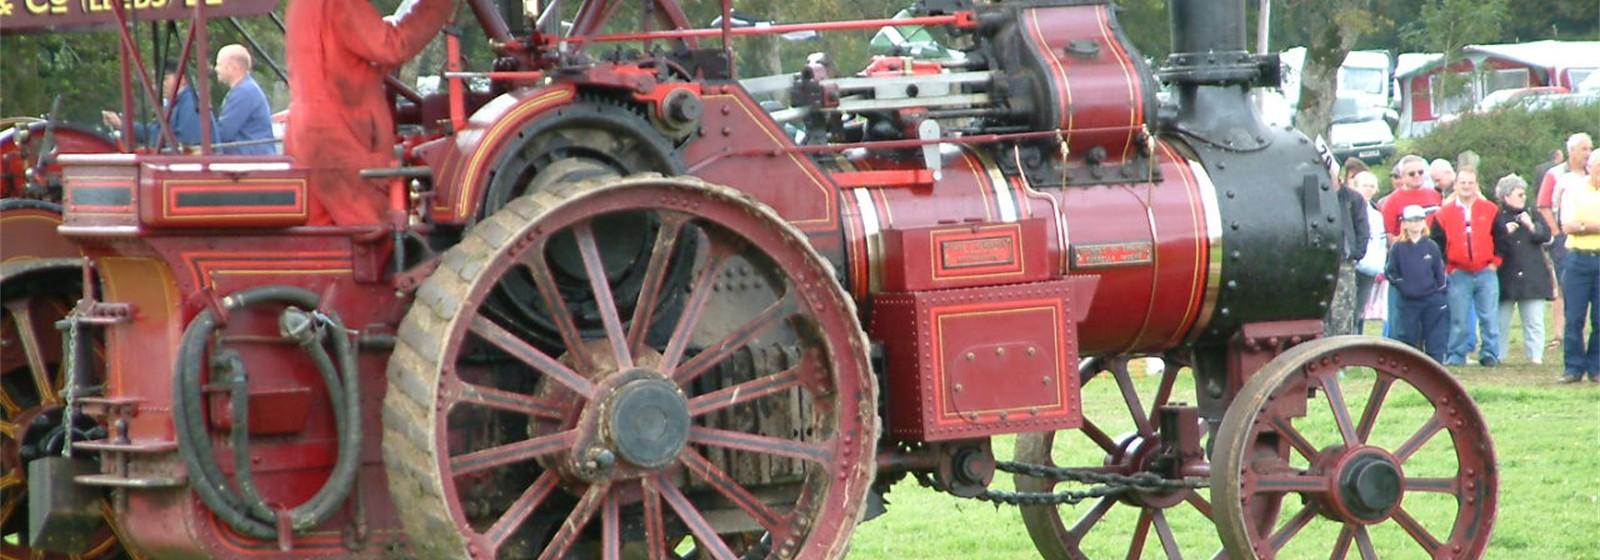 Vintage Steam Rally